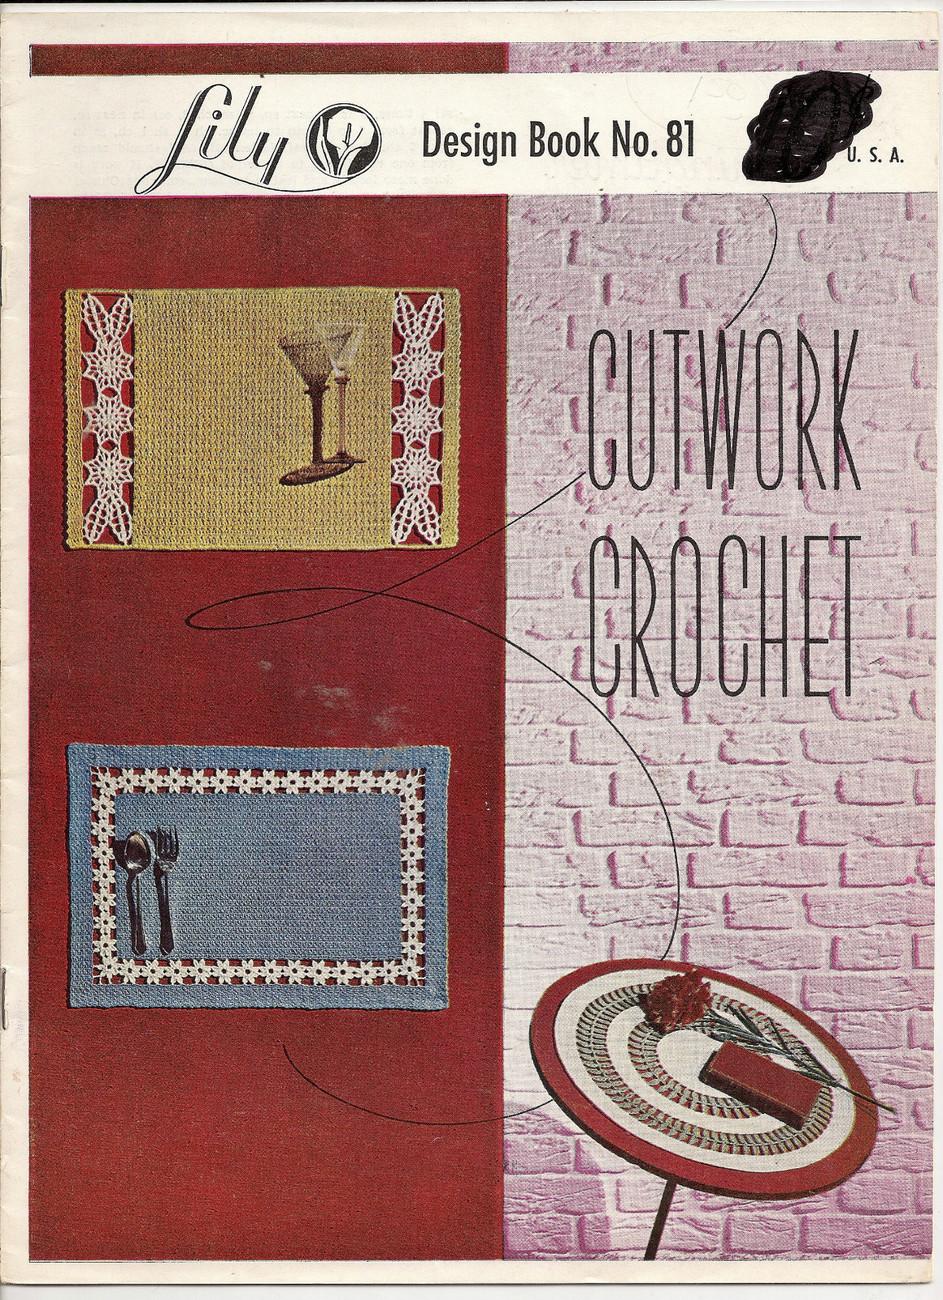 Cutwork Crochet Lily Design Book No 81 Lily Mills Vintage Crochet Patterns 1957